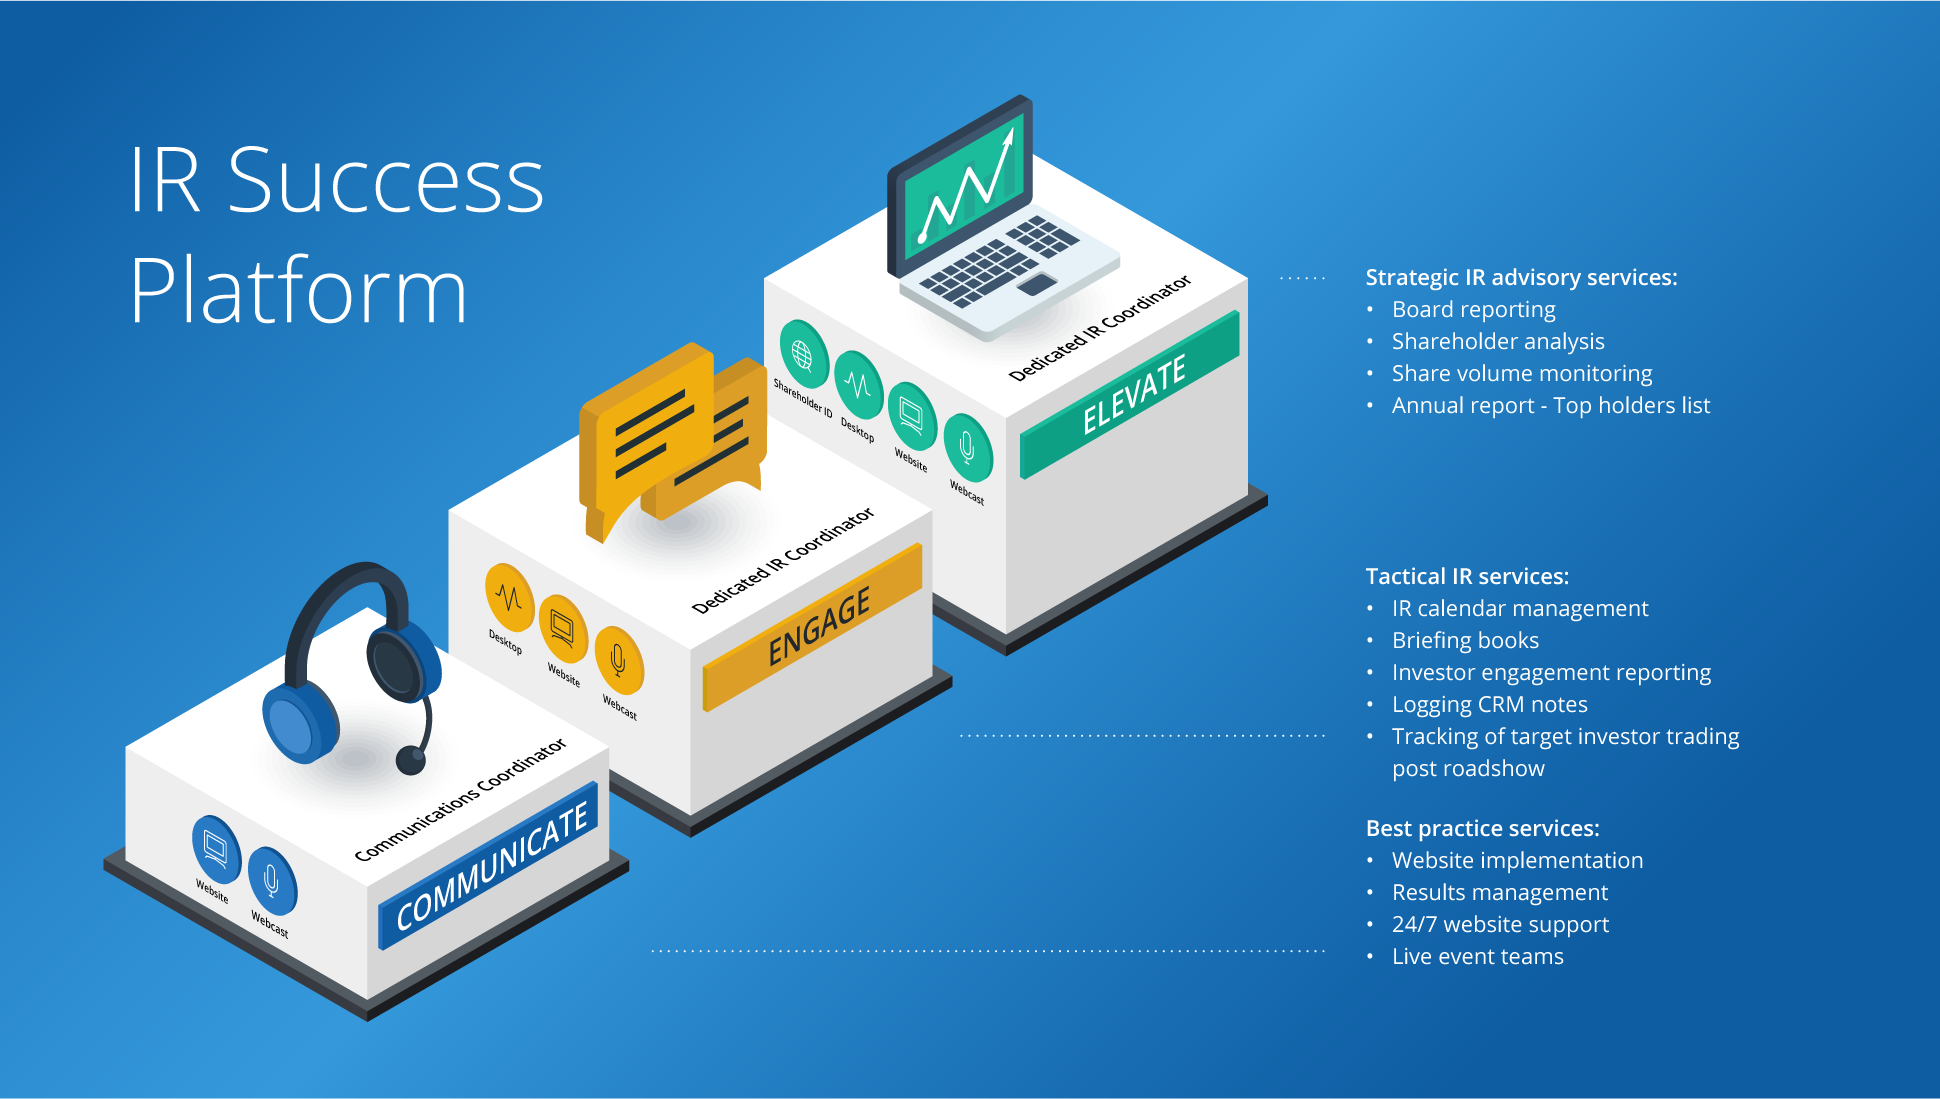 inset-ir-success-platform-eu@2x.png